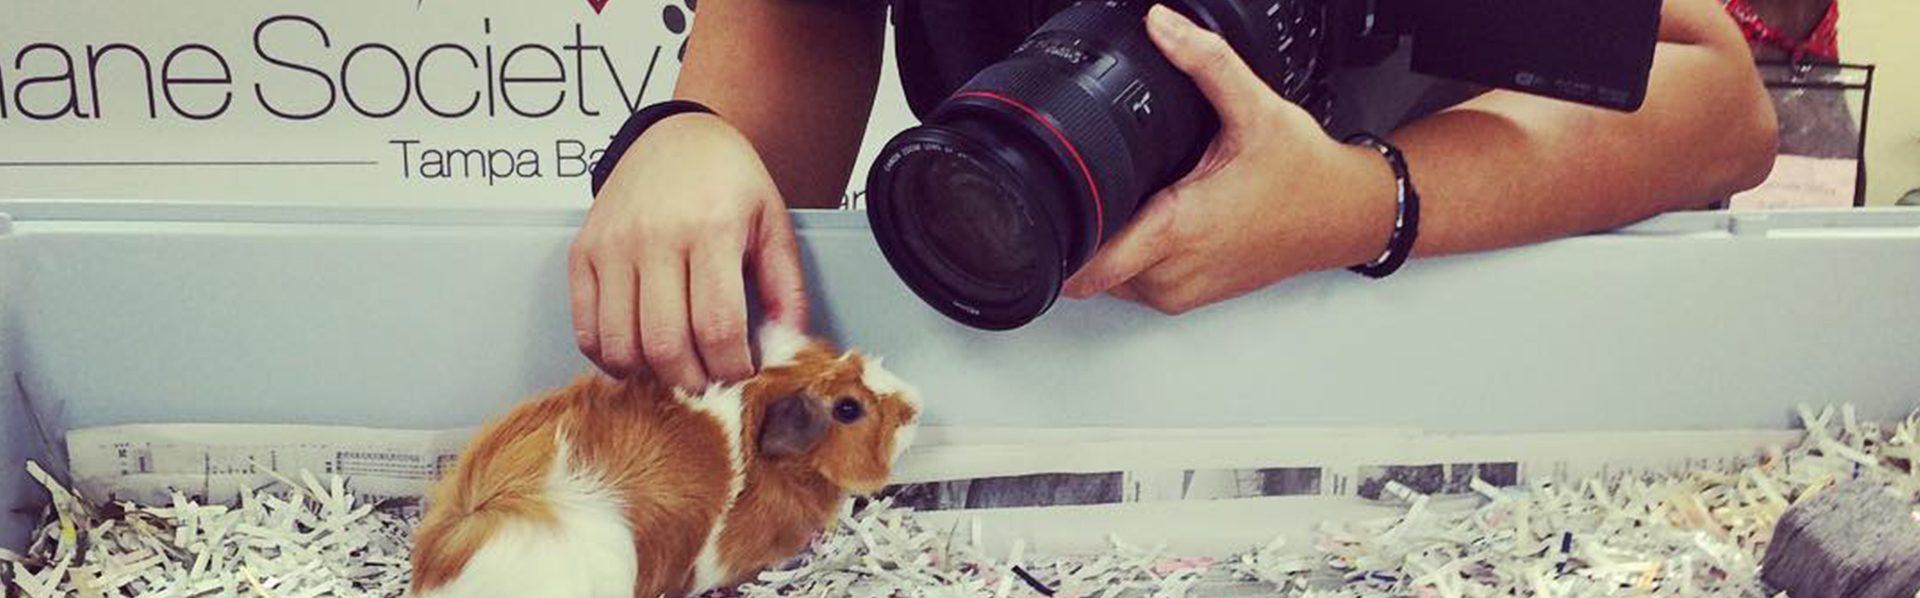 Humane Society photo shoot Schifino Lee Tampa, Florida